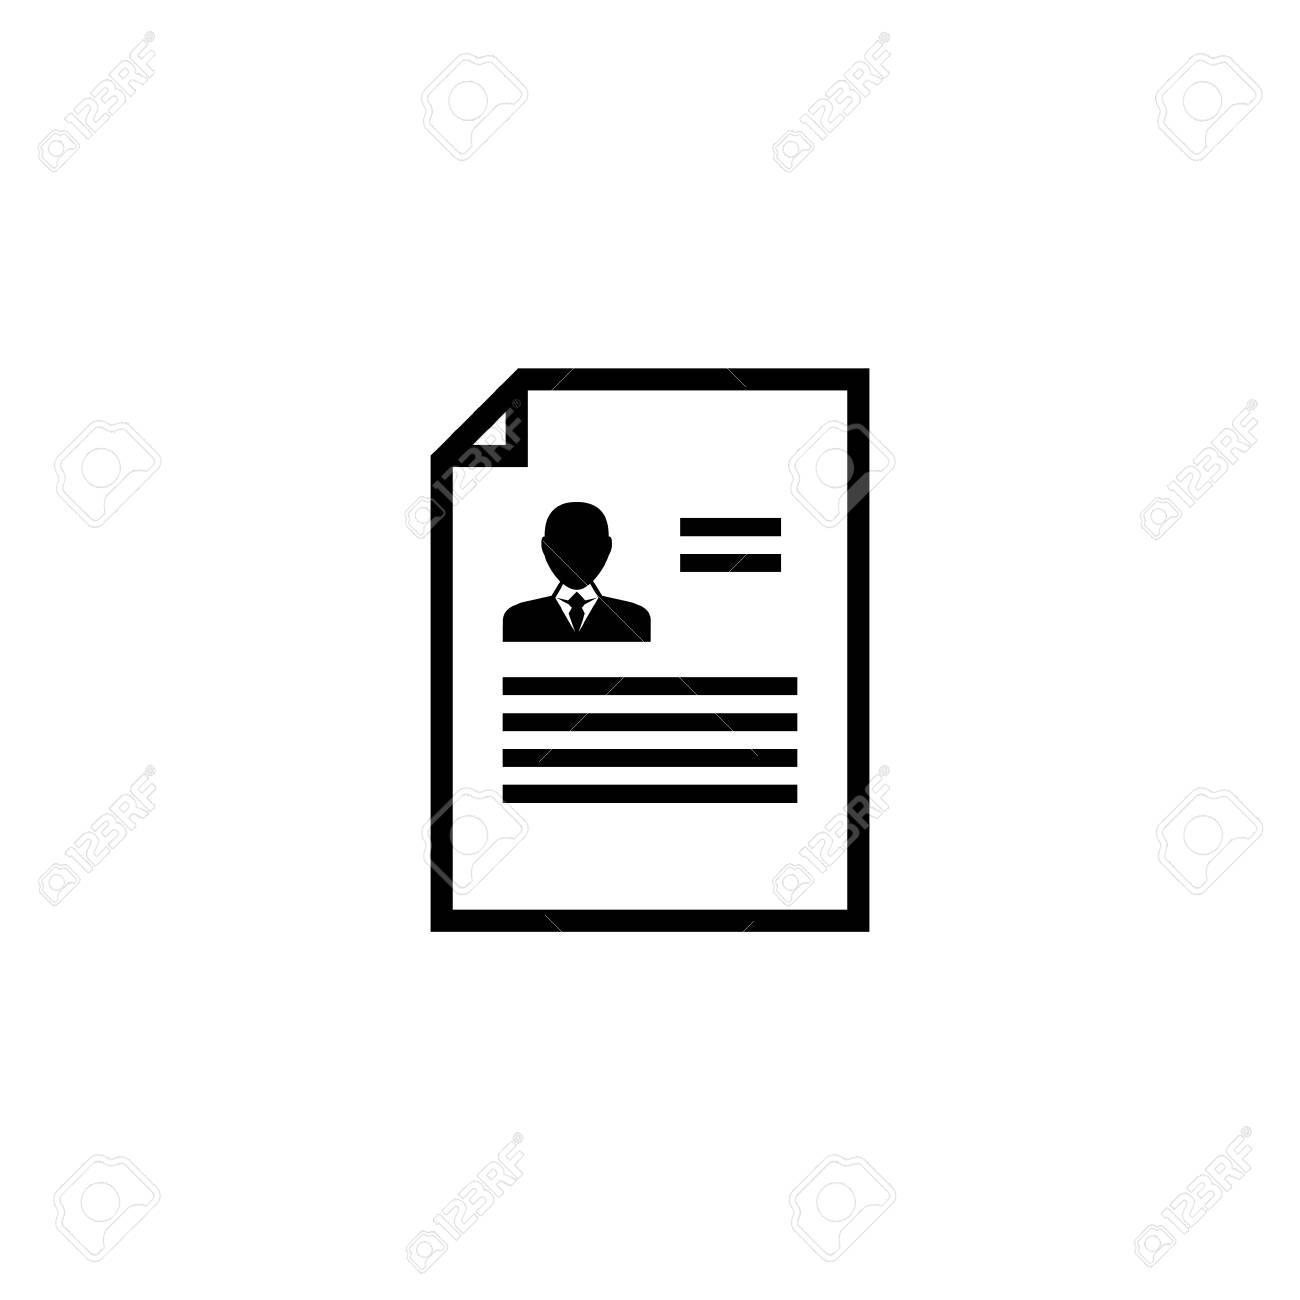 Resume CV. Flat Vector Icon Illustration. Simple Black Symbol ...